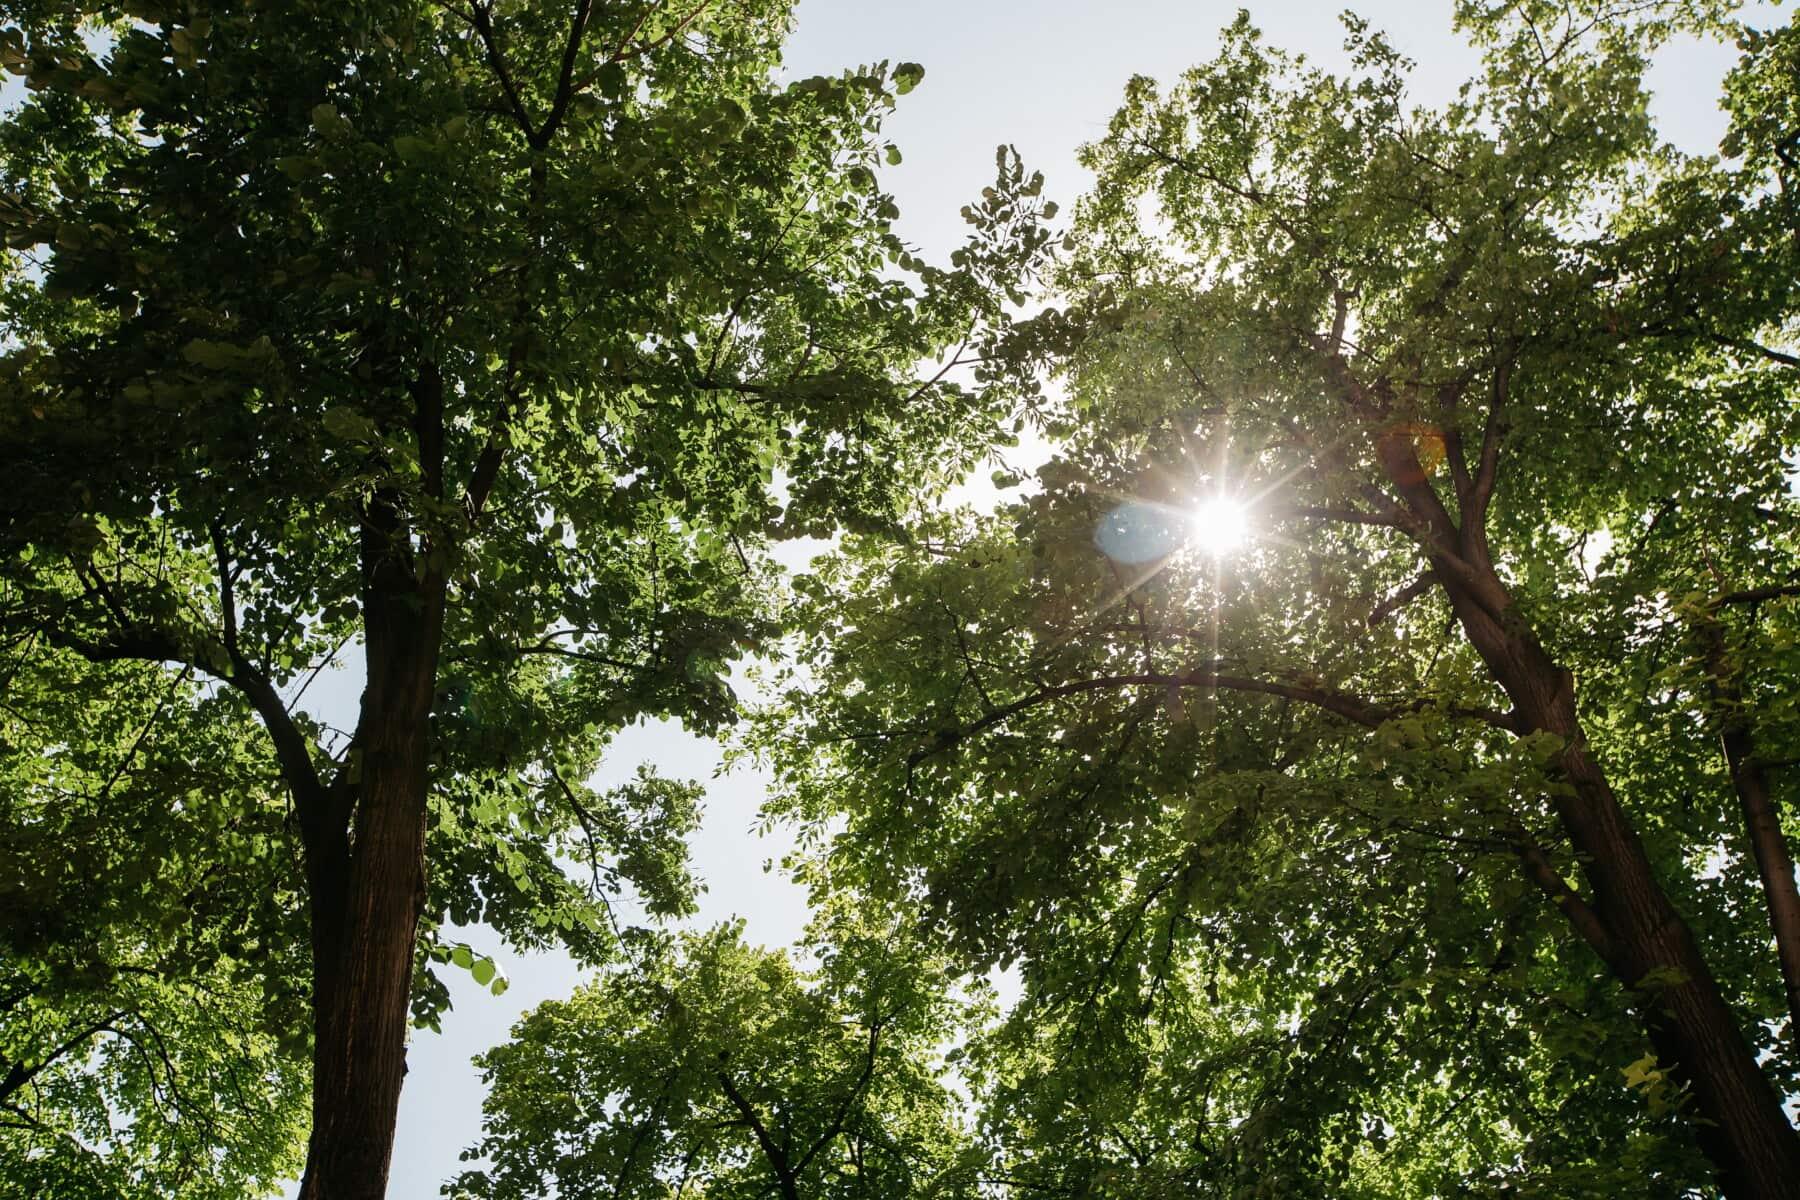 pohon, sinar matahari, cerah, cabang, sinar matahari, hutan, daun, tanaman, pohon, taman